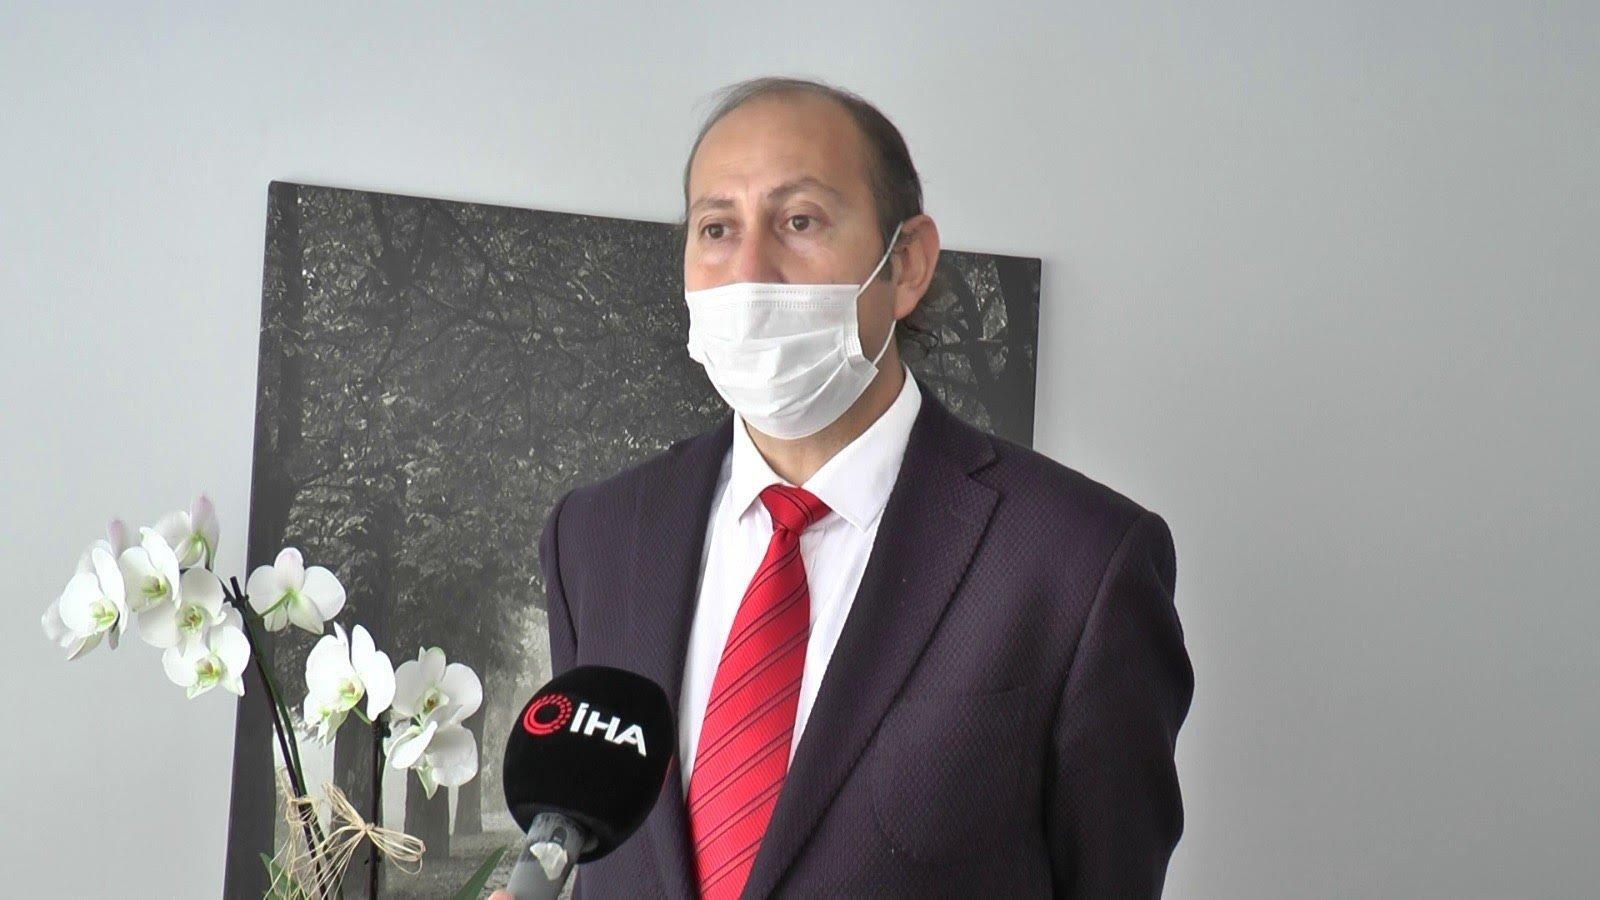 Professor Ahmet Oğuzhan Özen speaks during an interview, in Istanbul, Turkey, Jan. 7, 2021. (İHA PHOTO)